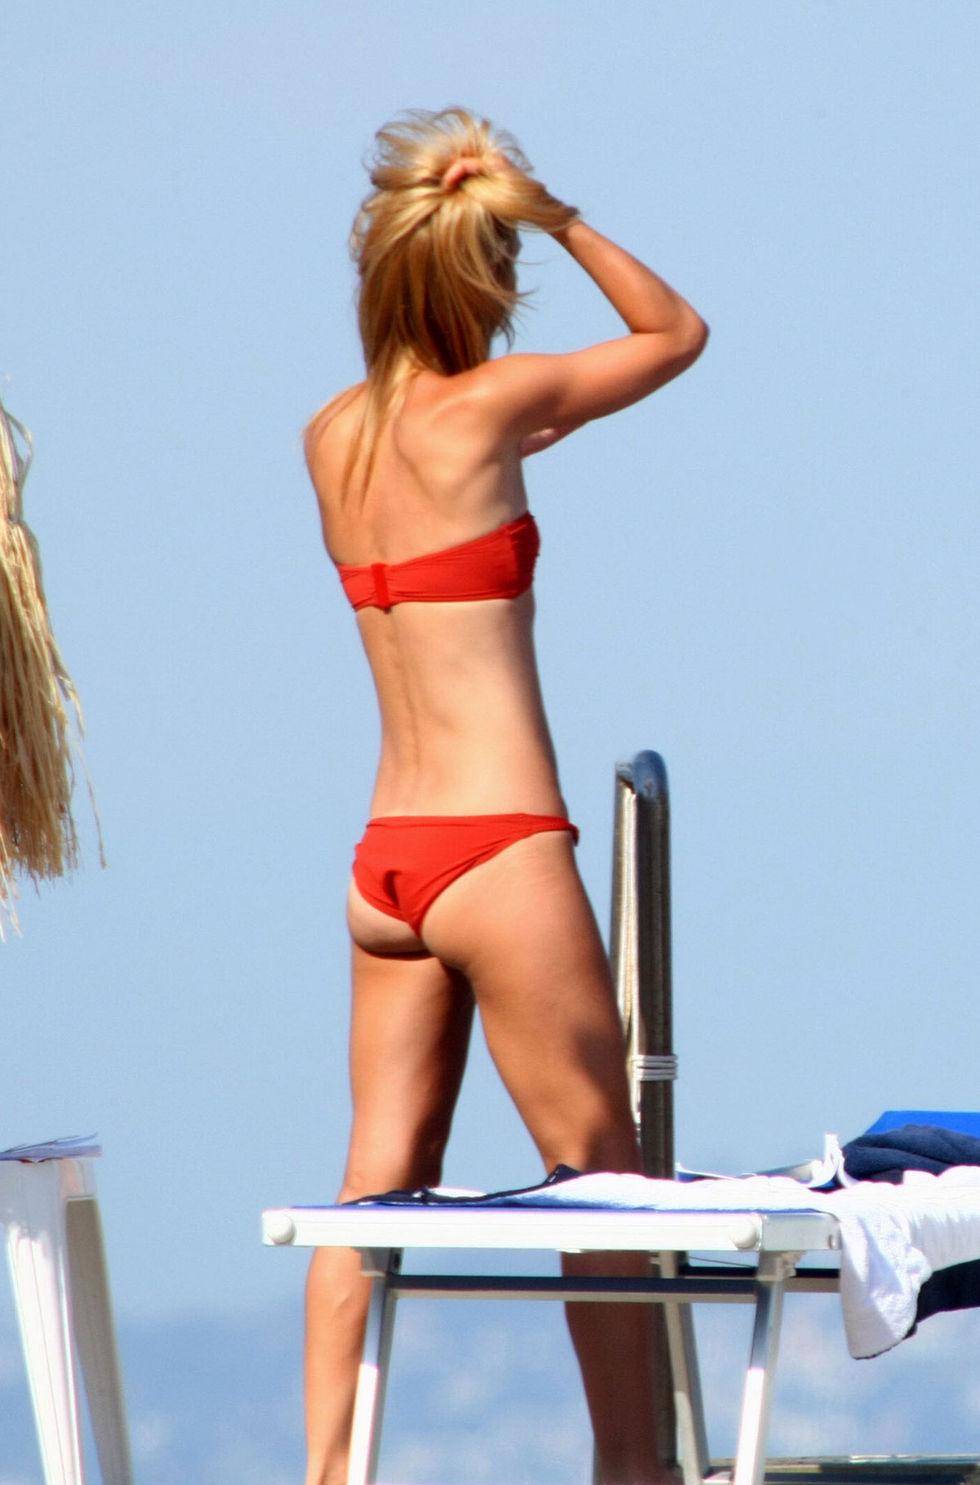 Bikini Claire Danes nude (89 photos), Tits, Fappening, Selfie, braless 2006